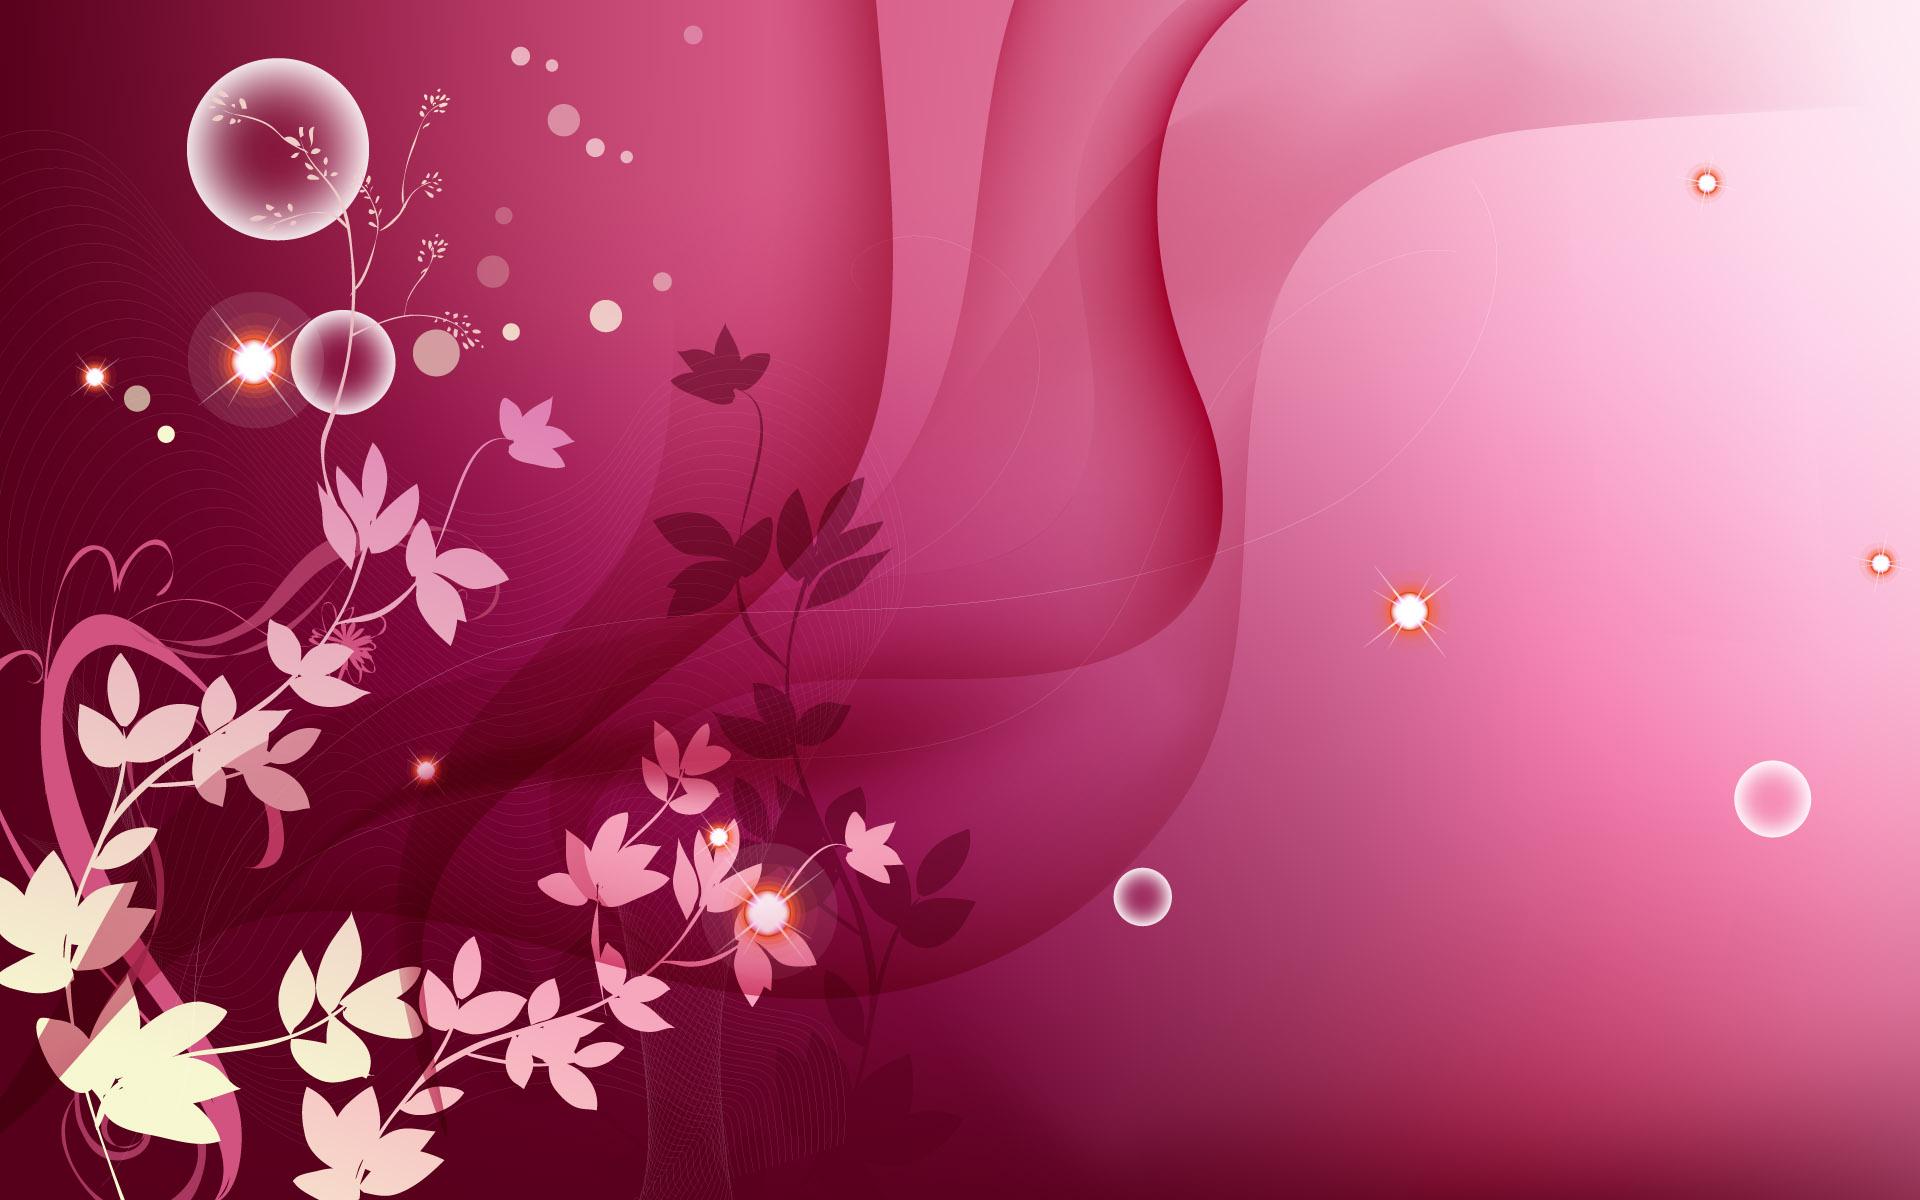 Pink Wallpapers wallpaper Pink Wallpapers hd wallpaper 1920x1200